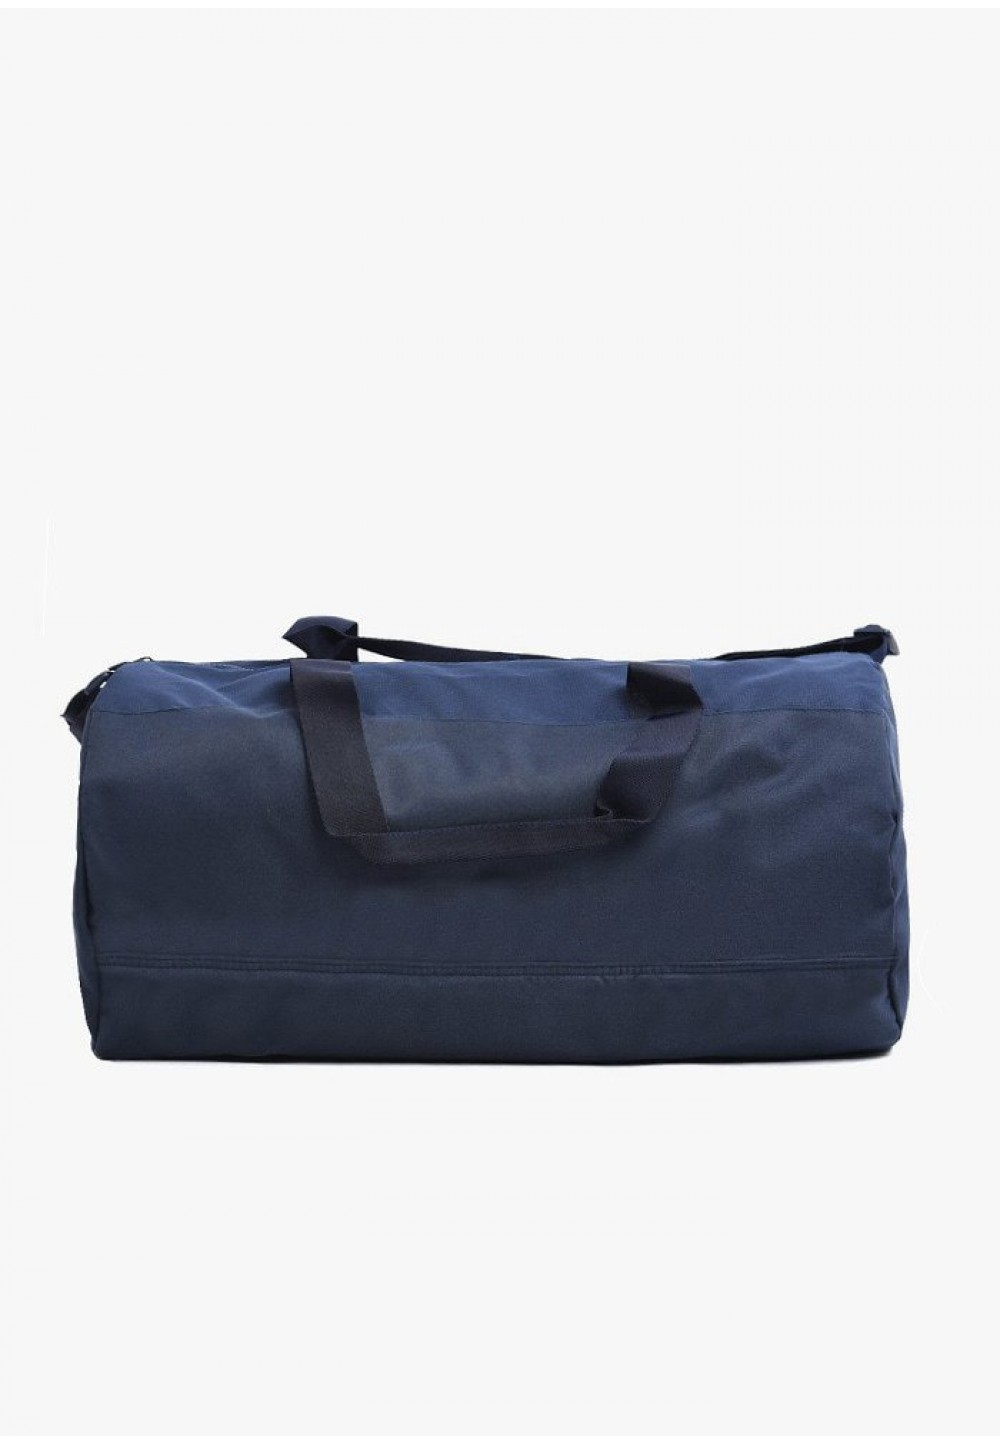 Синя спортивна чоловіча сумка